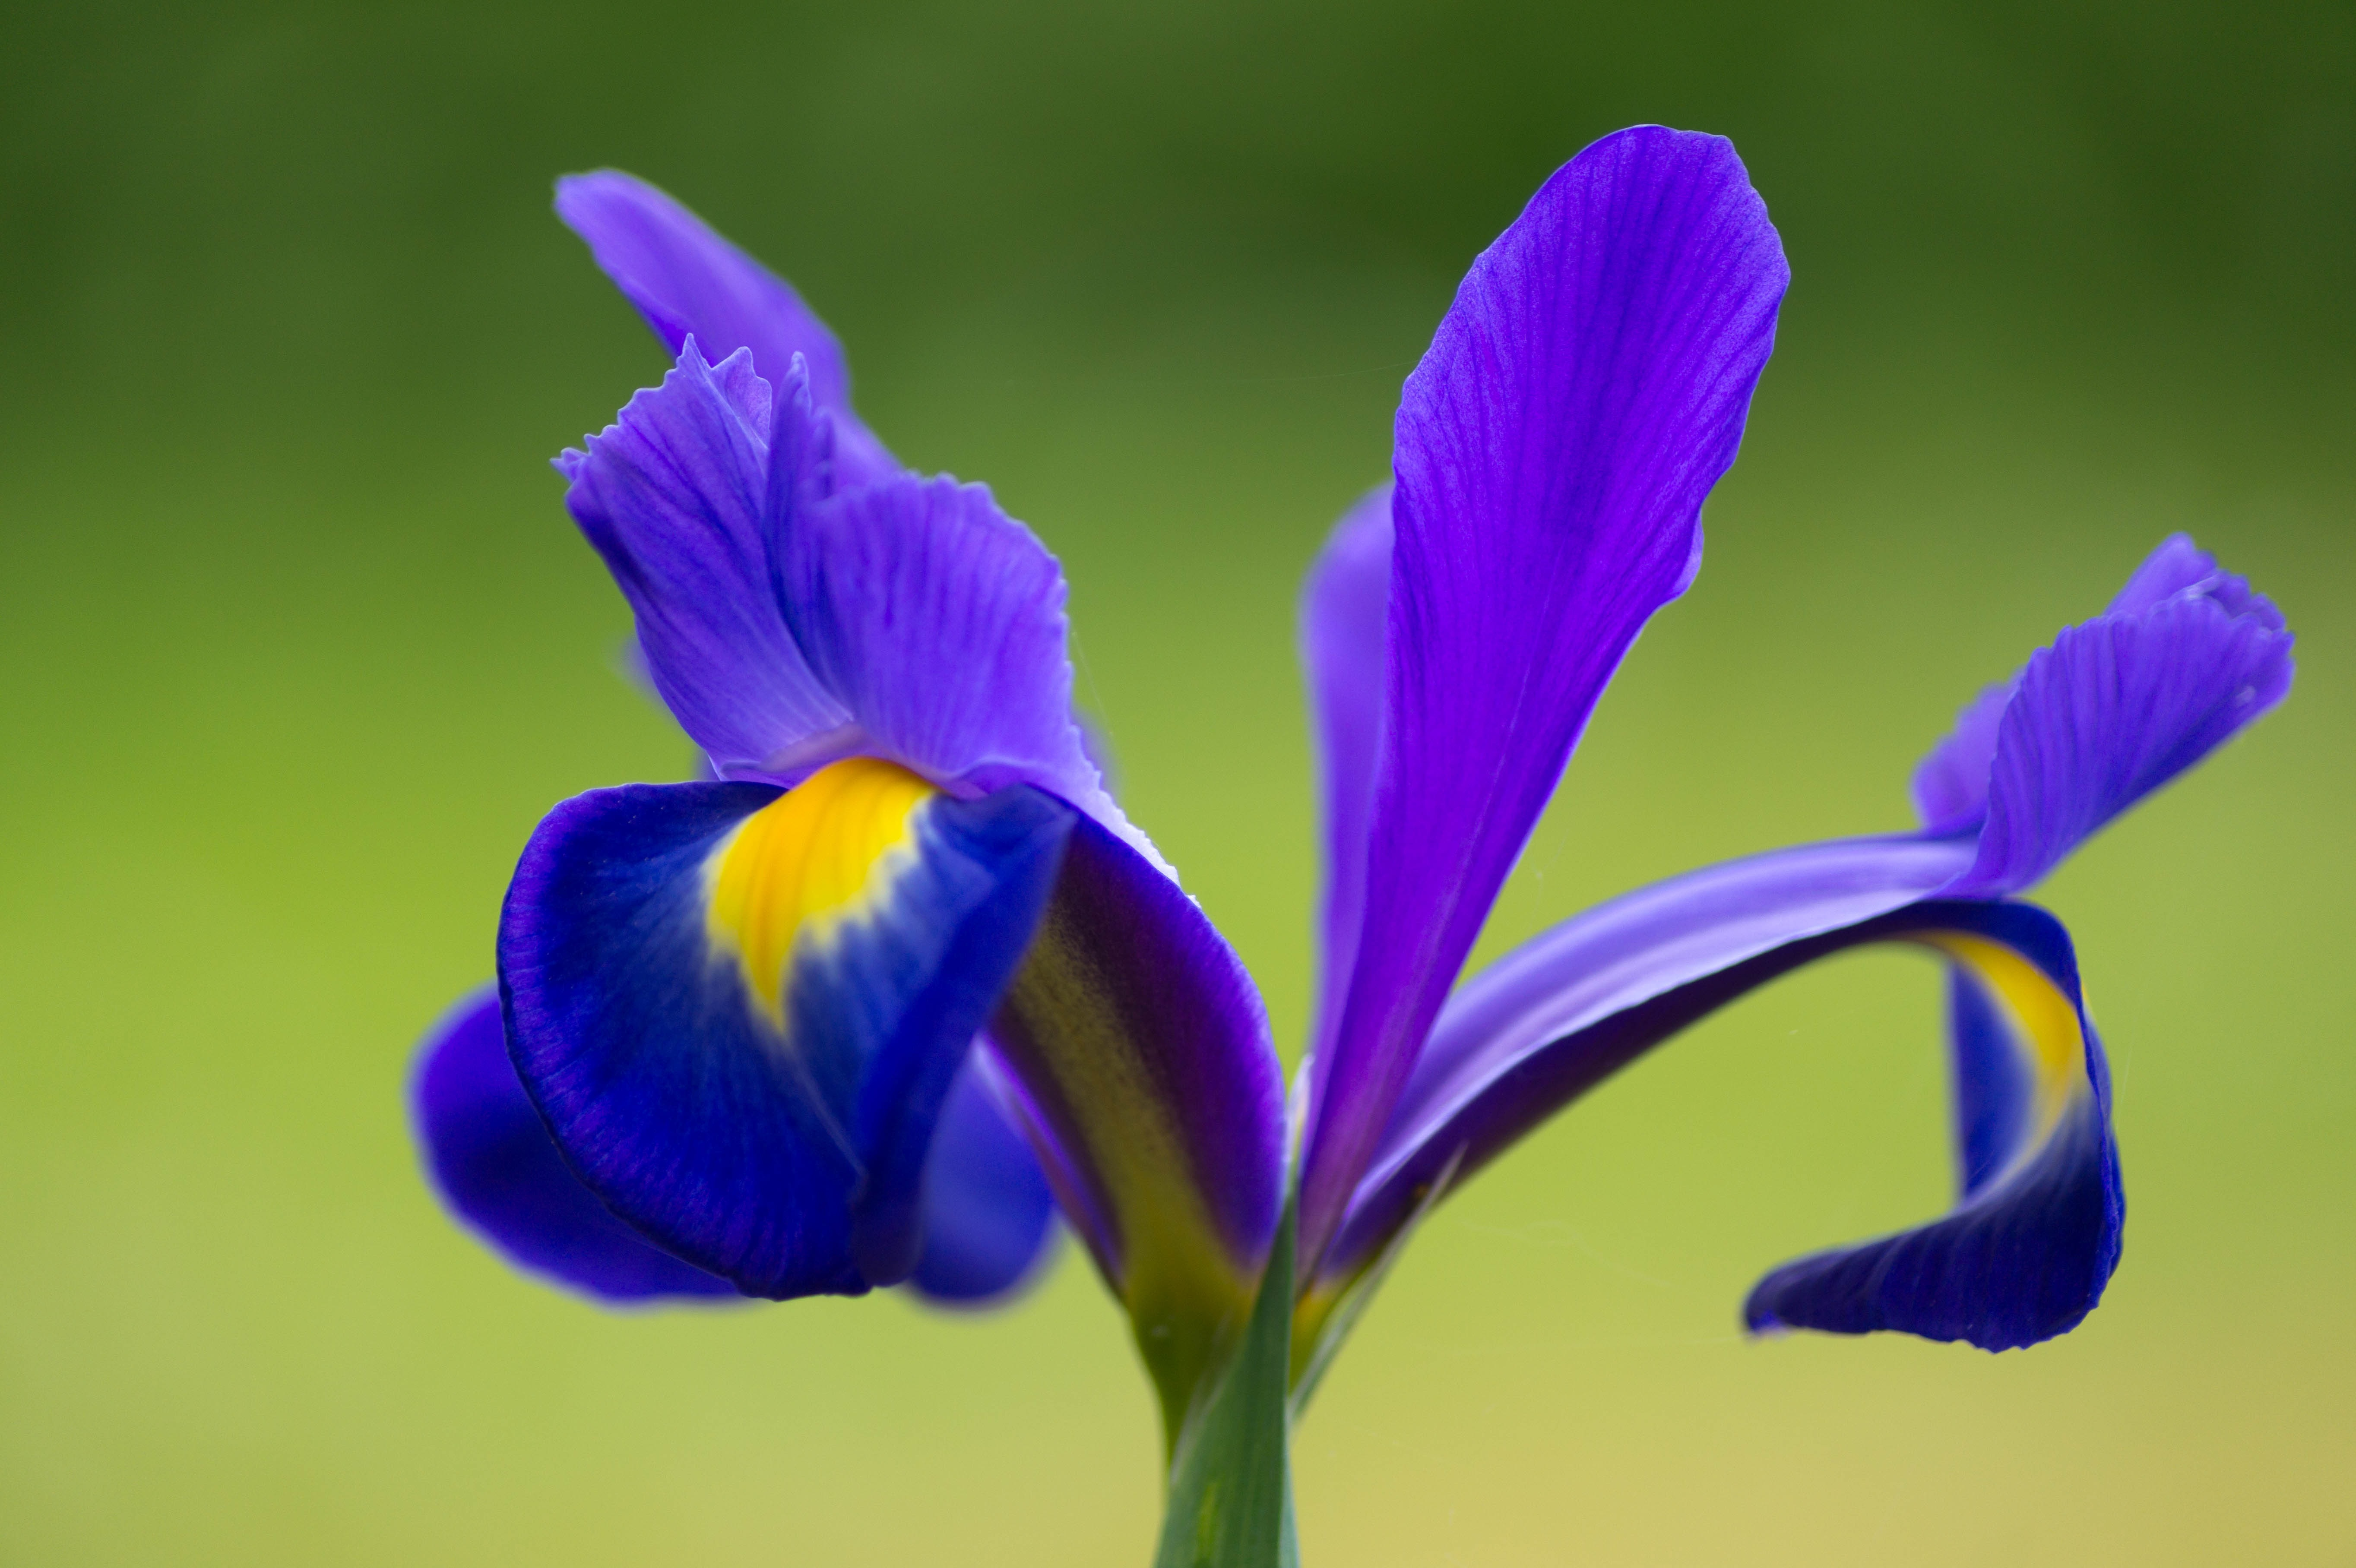 Closeup of iris flower free image closeup of iris flower free download izmirmasajfo